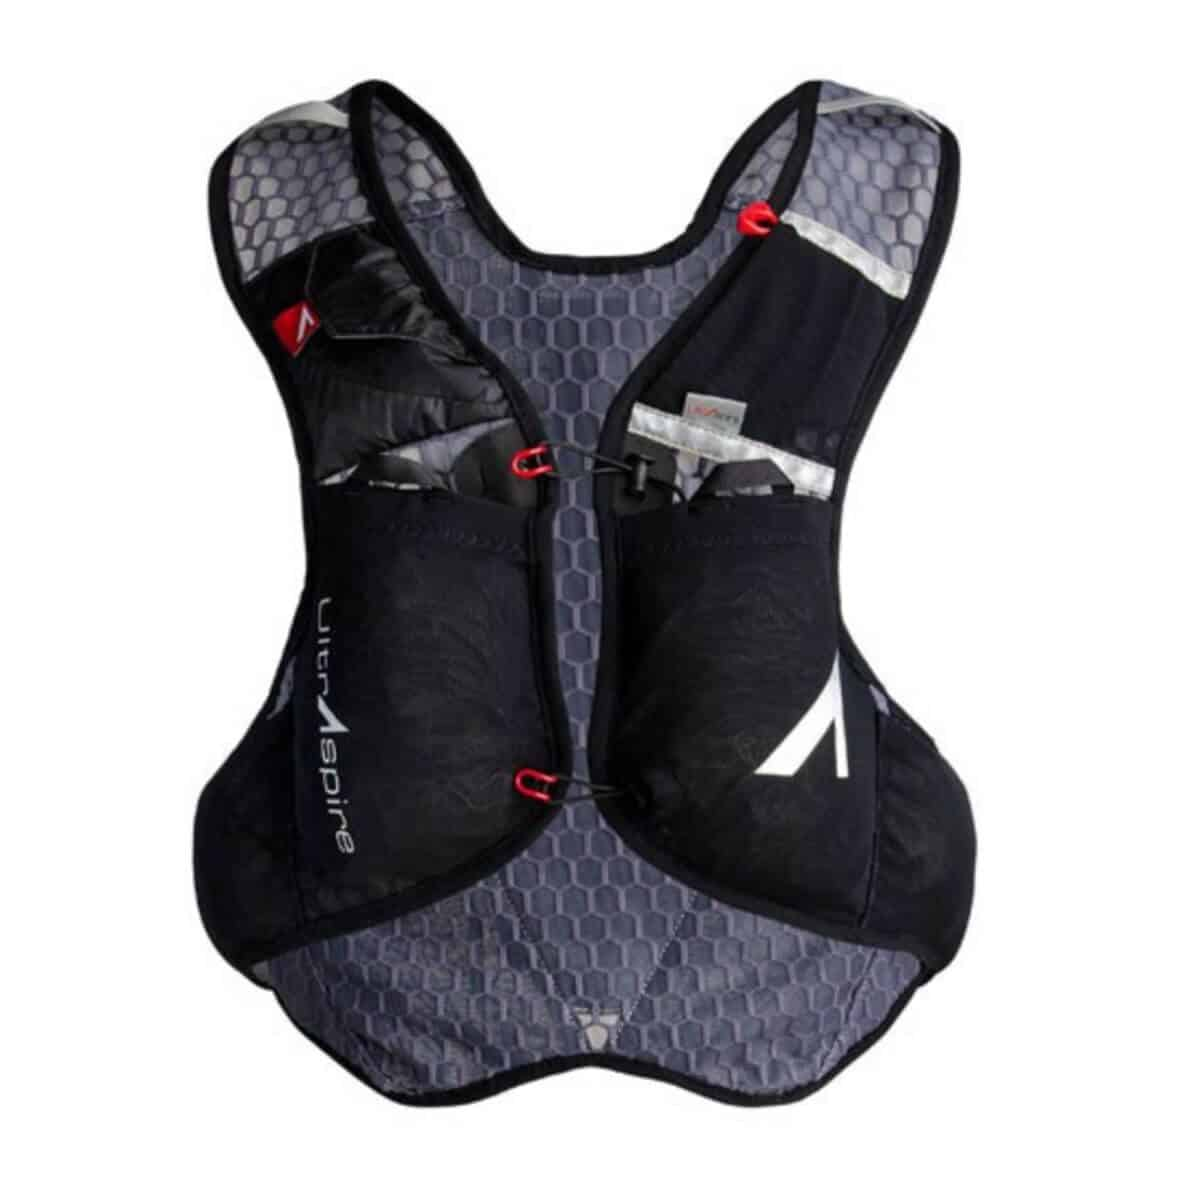 Black UltrAspire hydration vest.